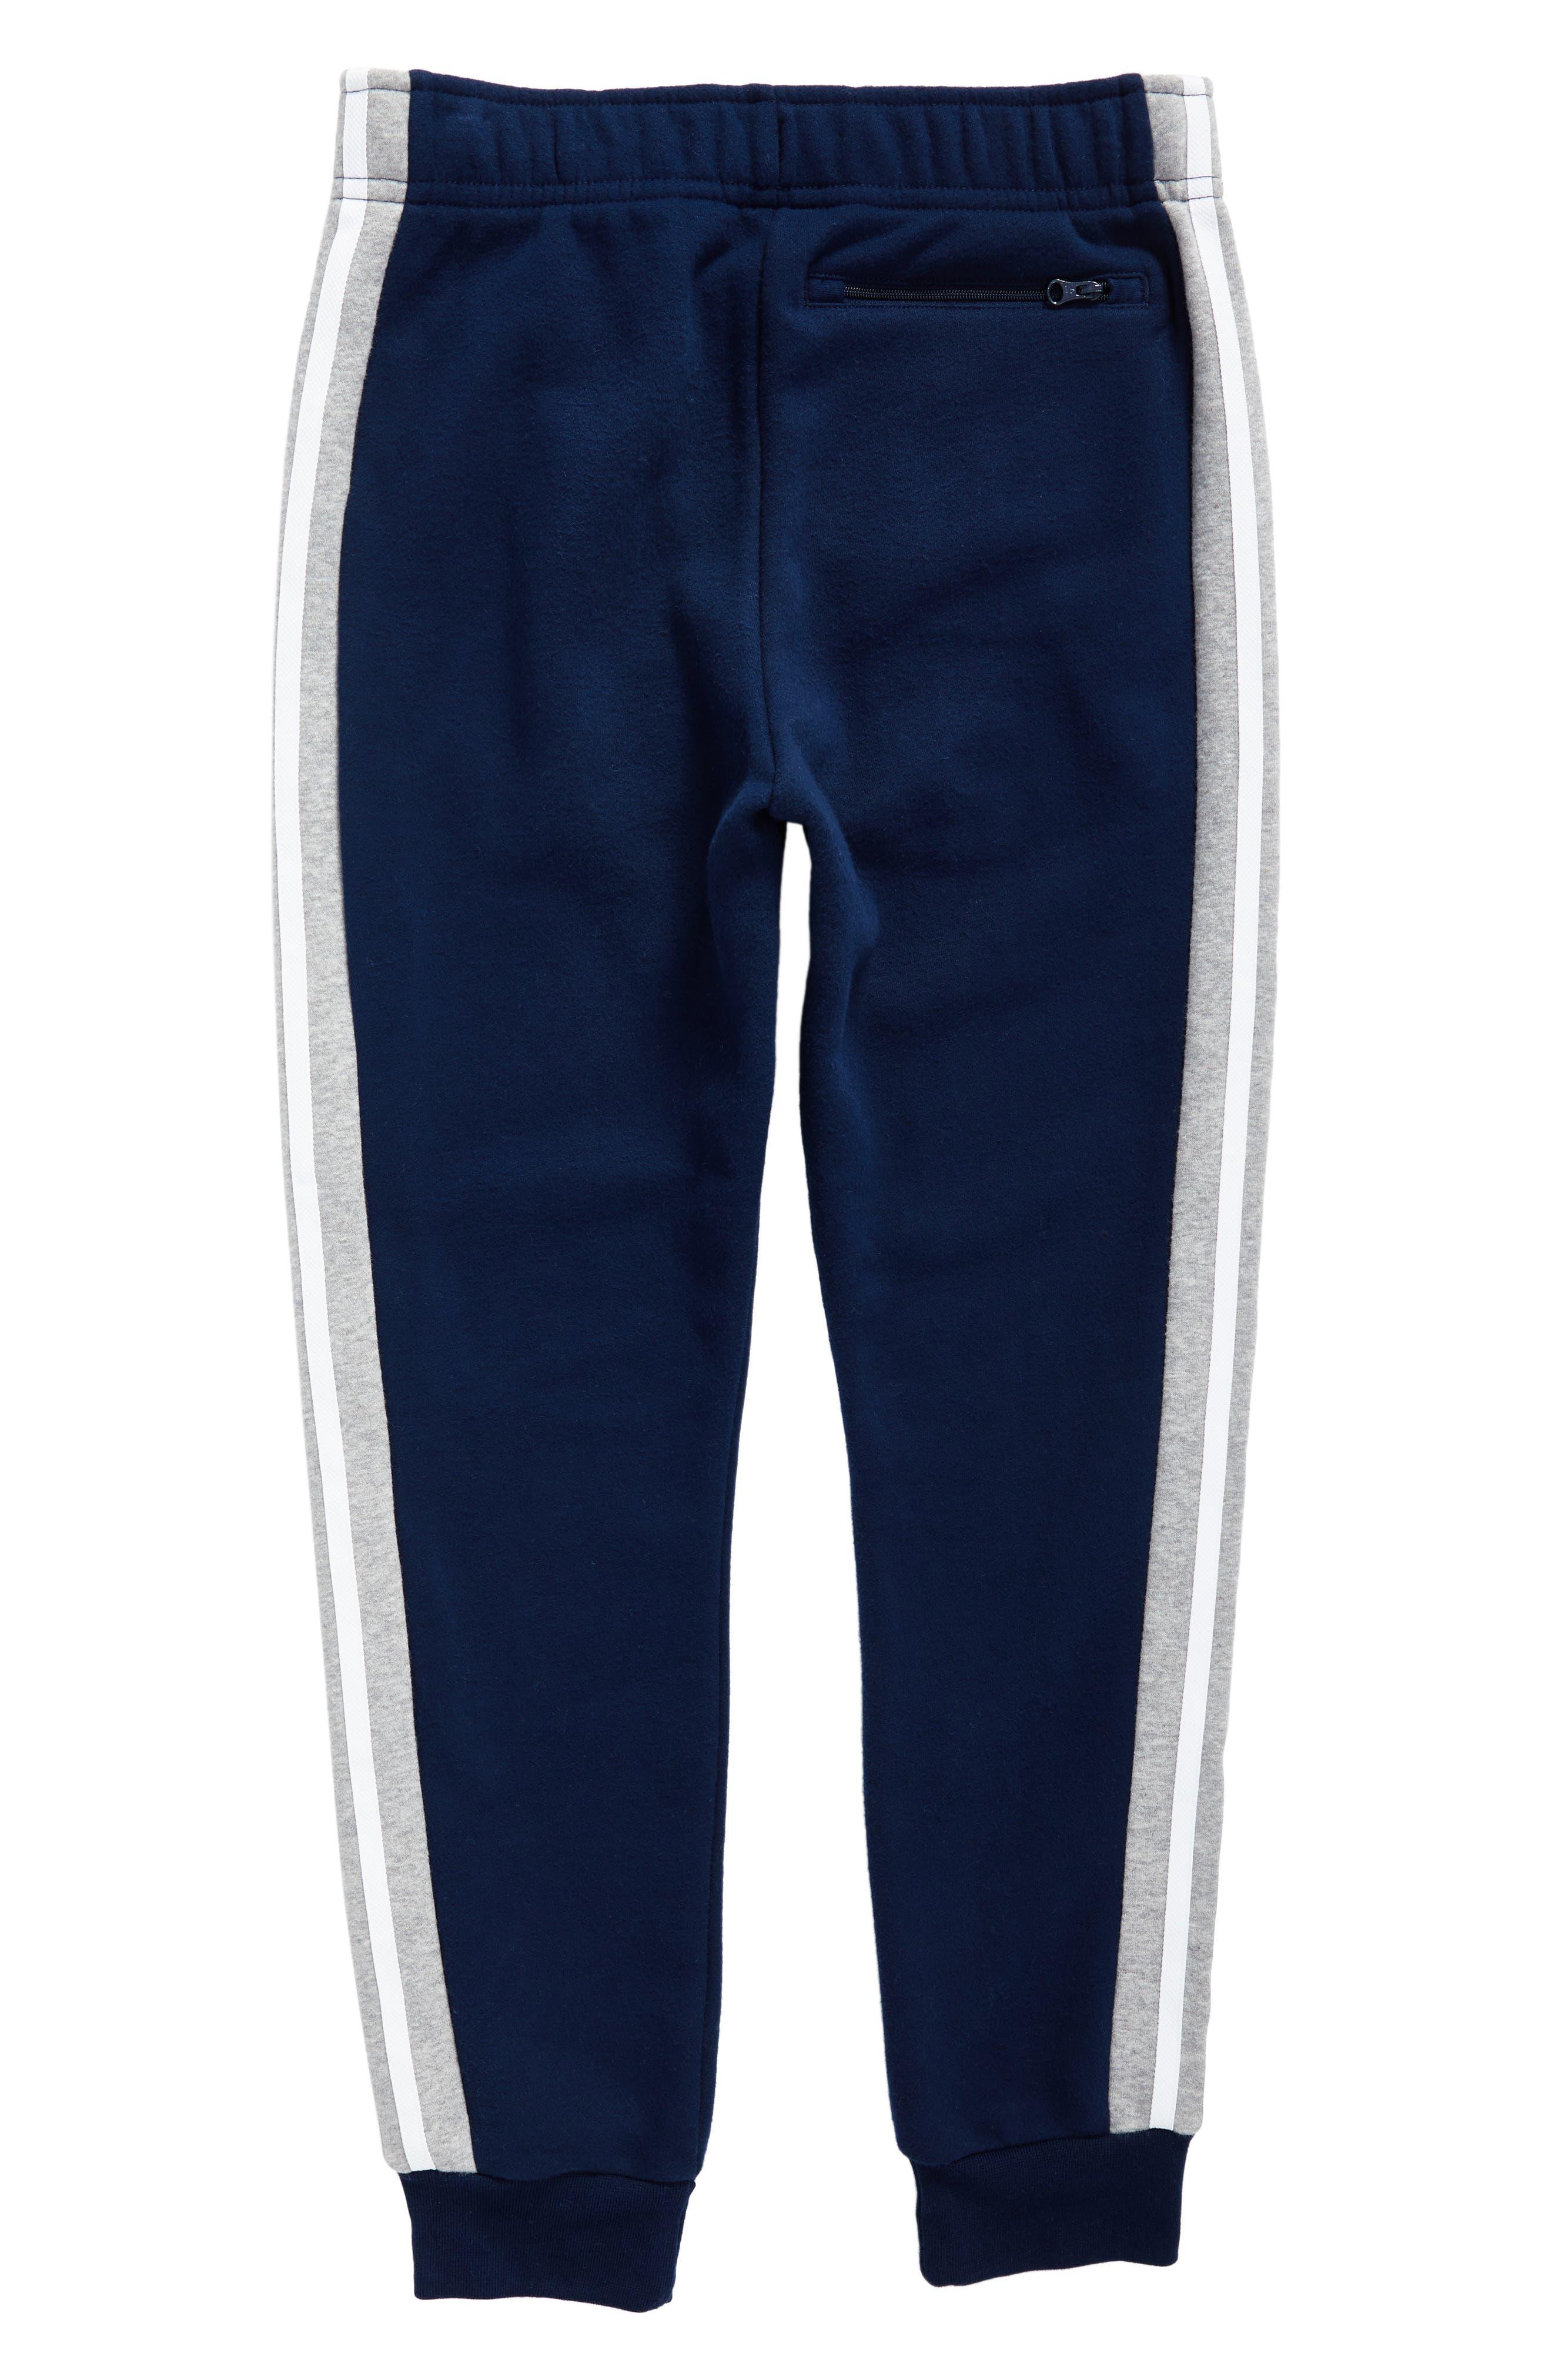 adidas FL Jogger Pants,                             Alternate thumbnail 2, color,                             415